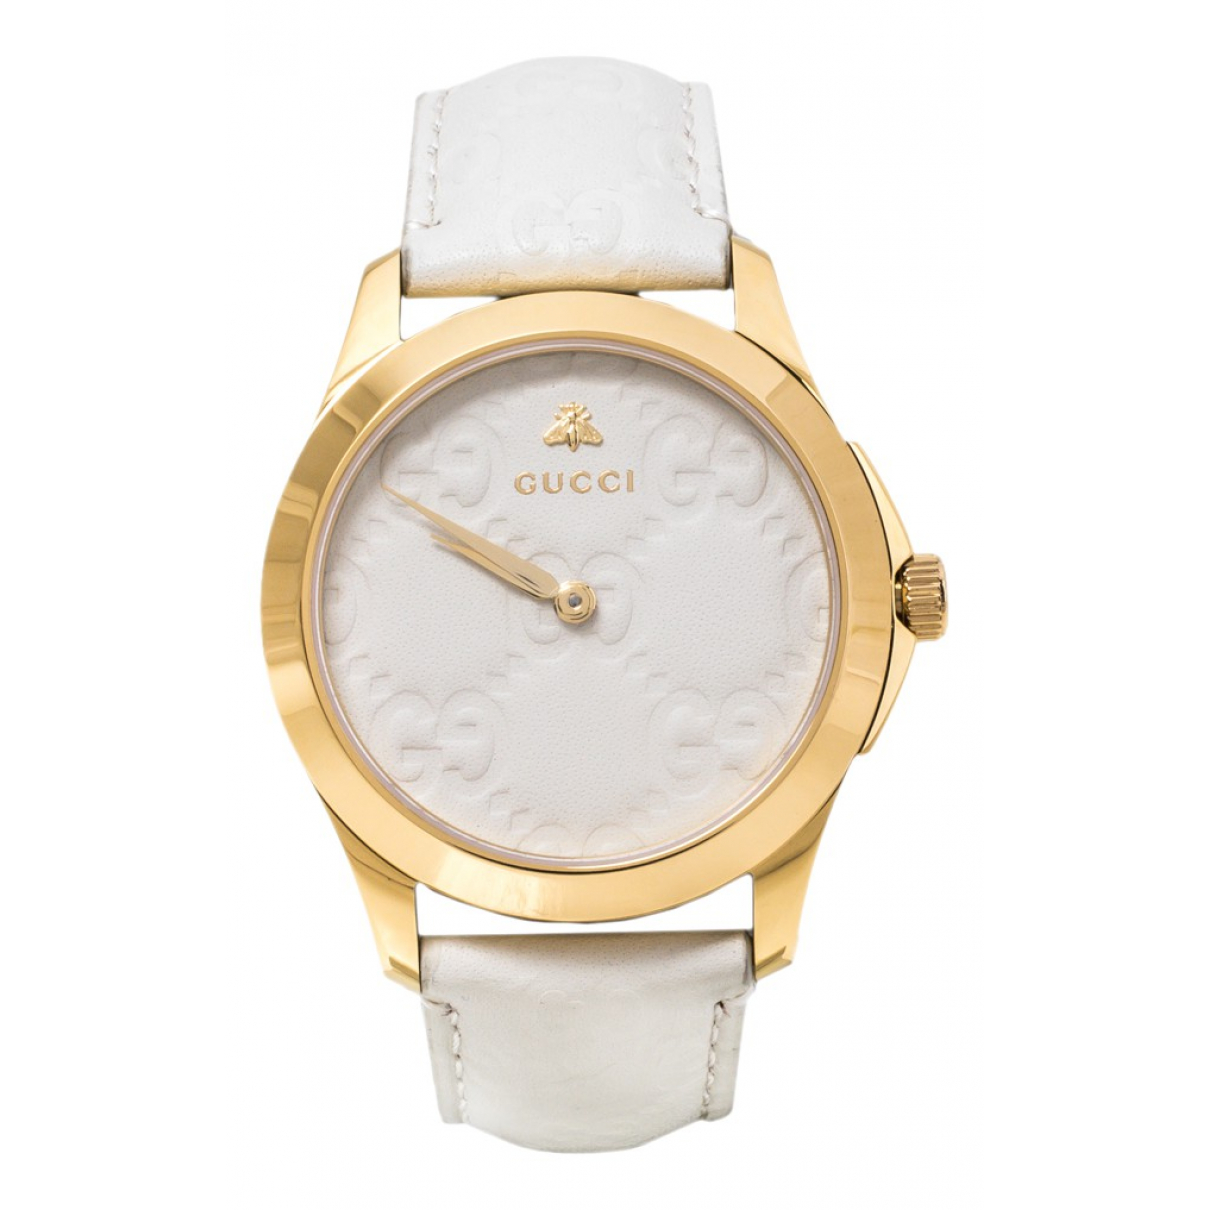 Gucci \N White Steel watch for Women \N